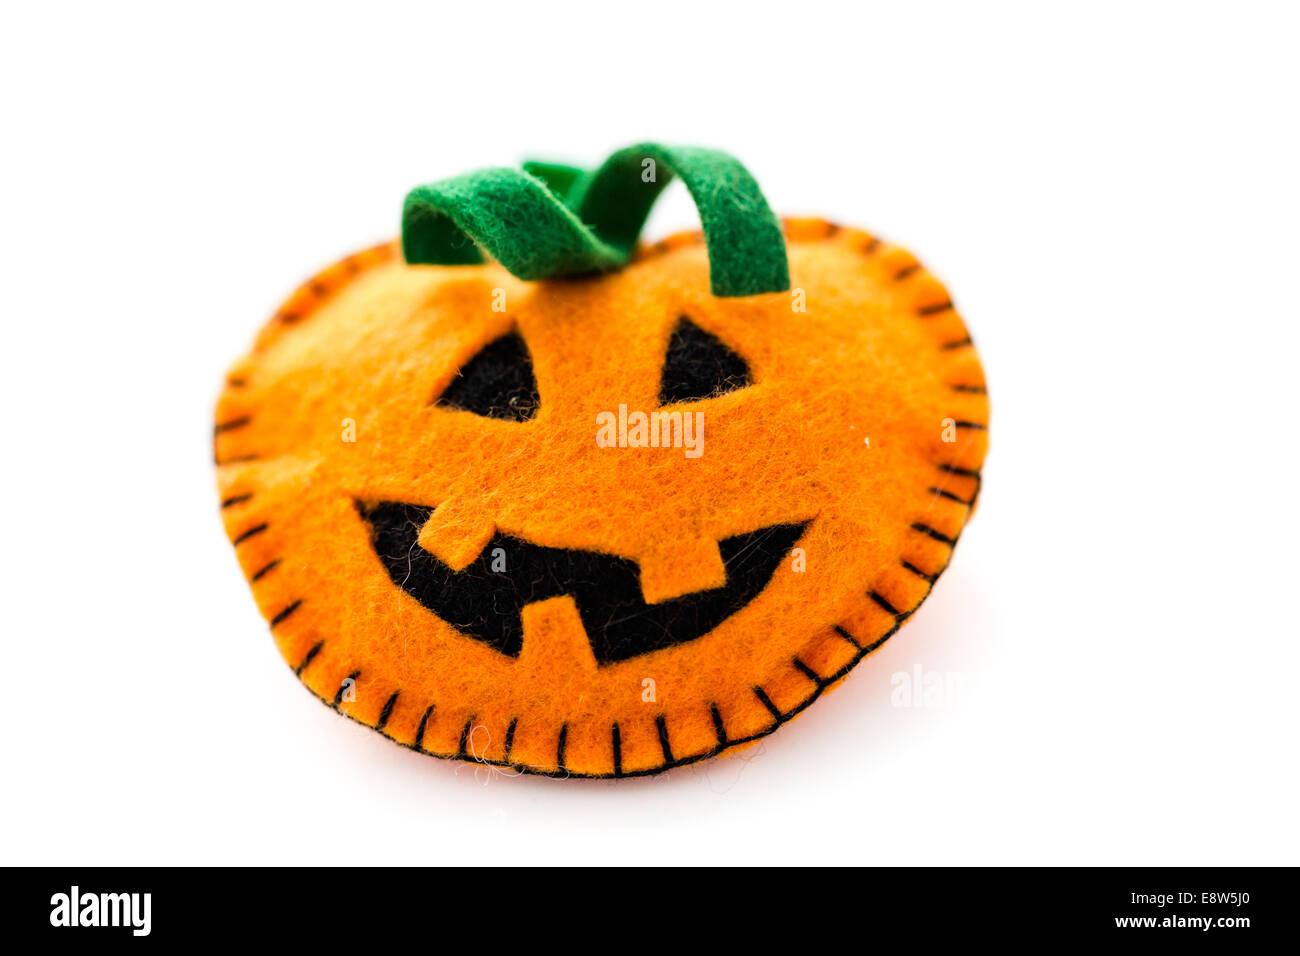 Handmade Halloween Decorations From Fabric Stock Photo ...